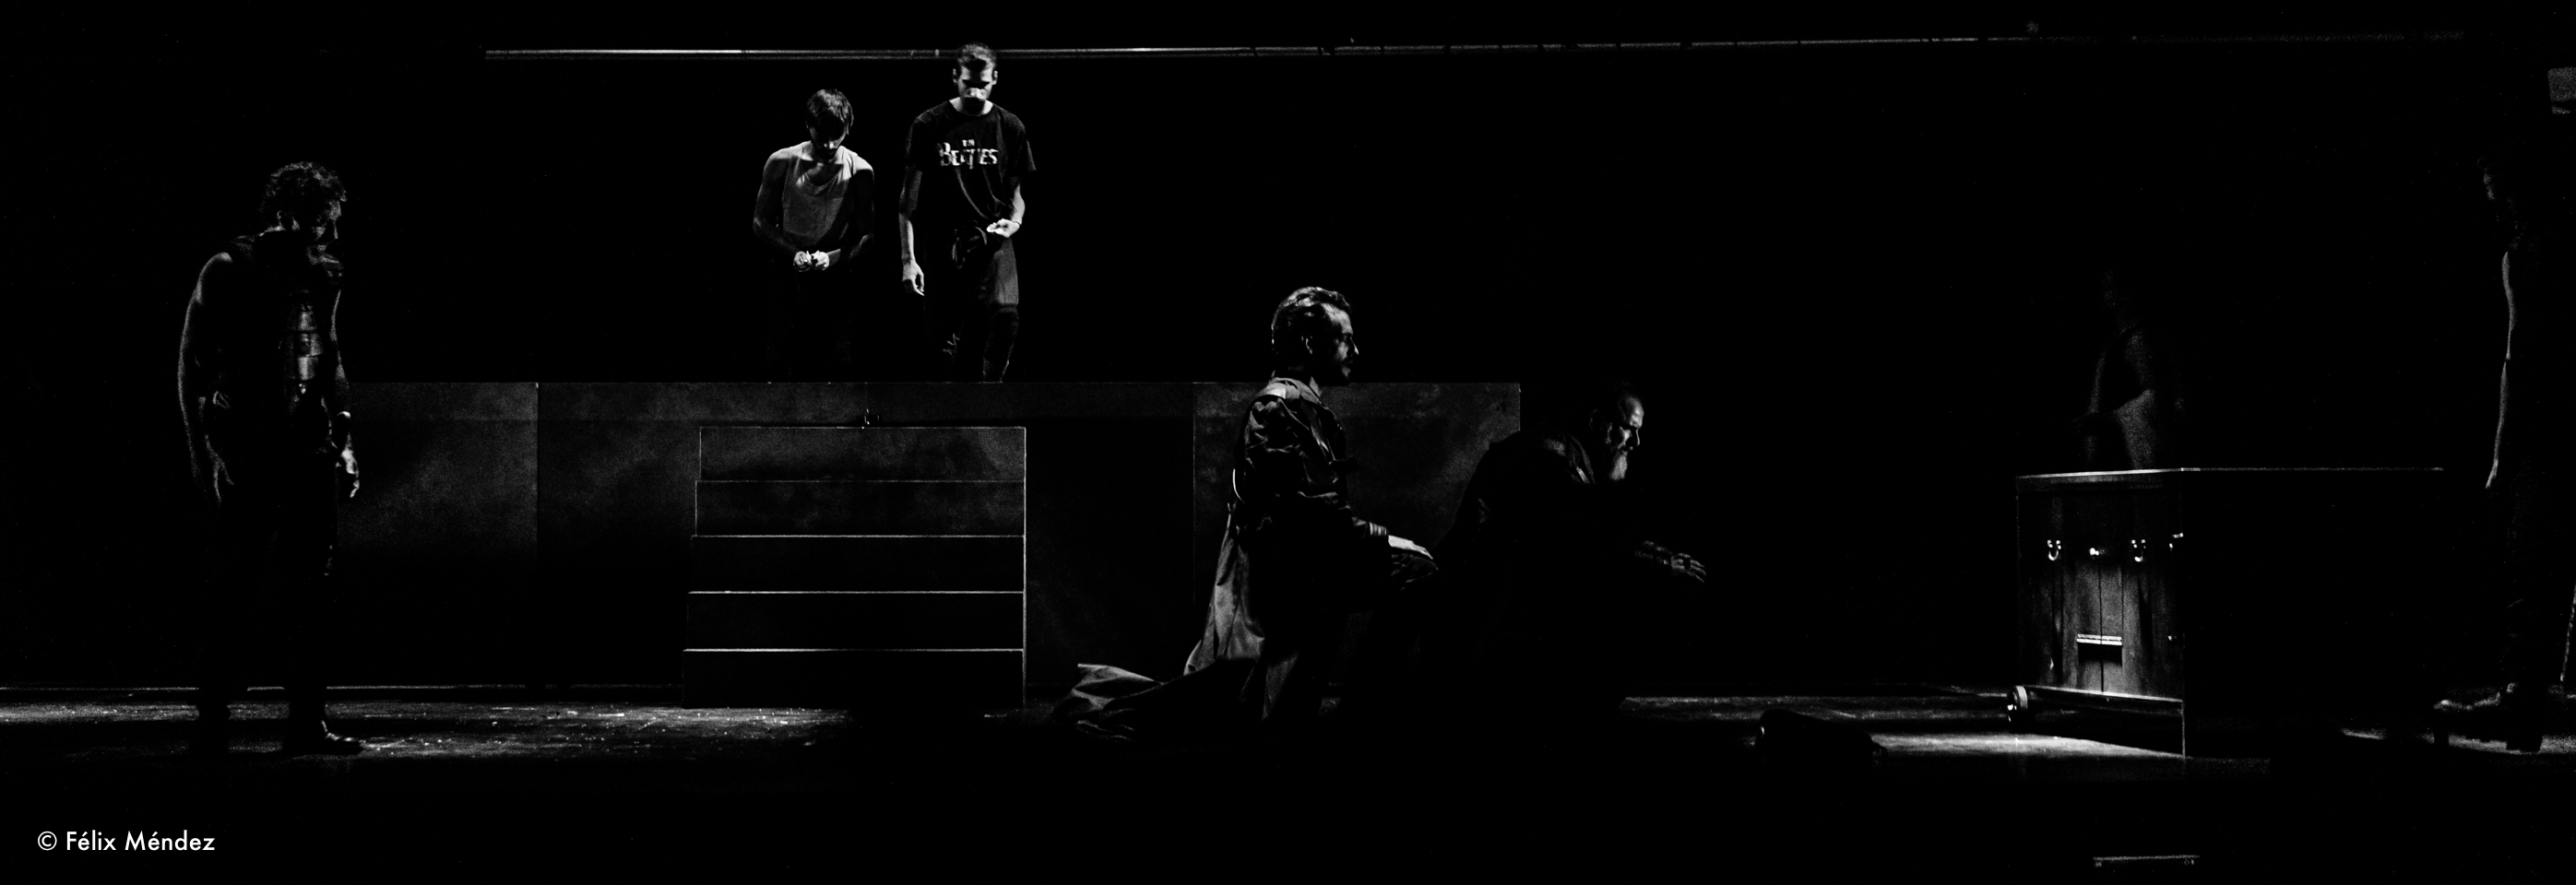 jose-vicente-moiron-cultura-overdose-badajoz-04